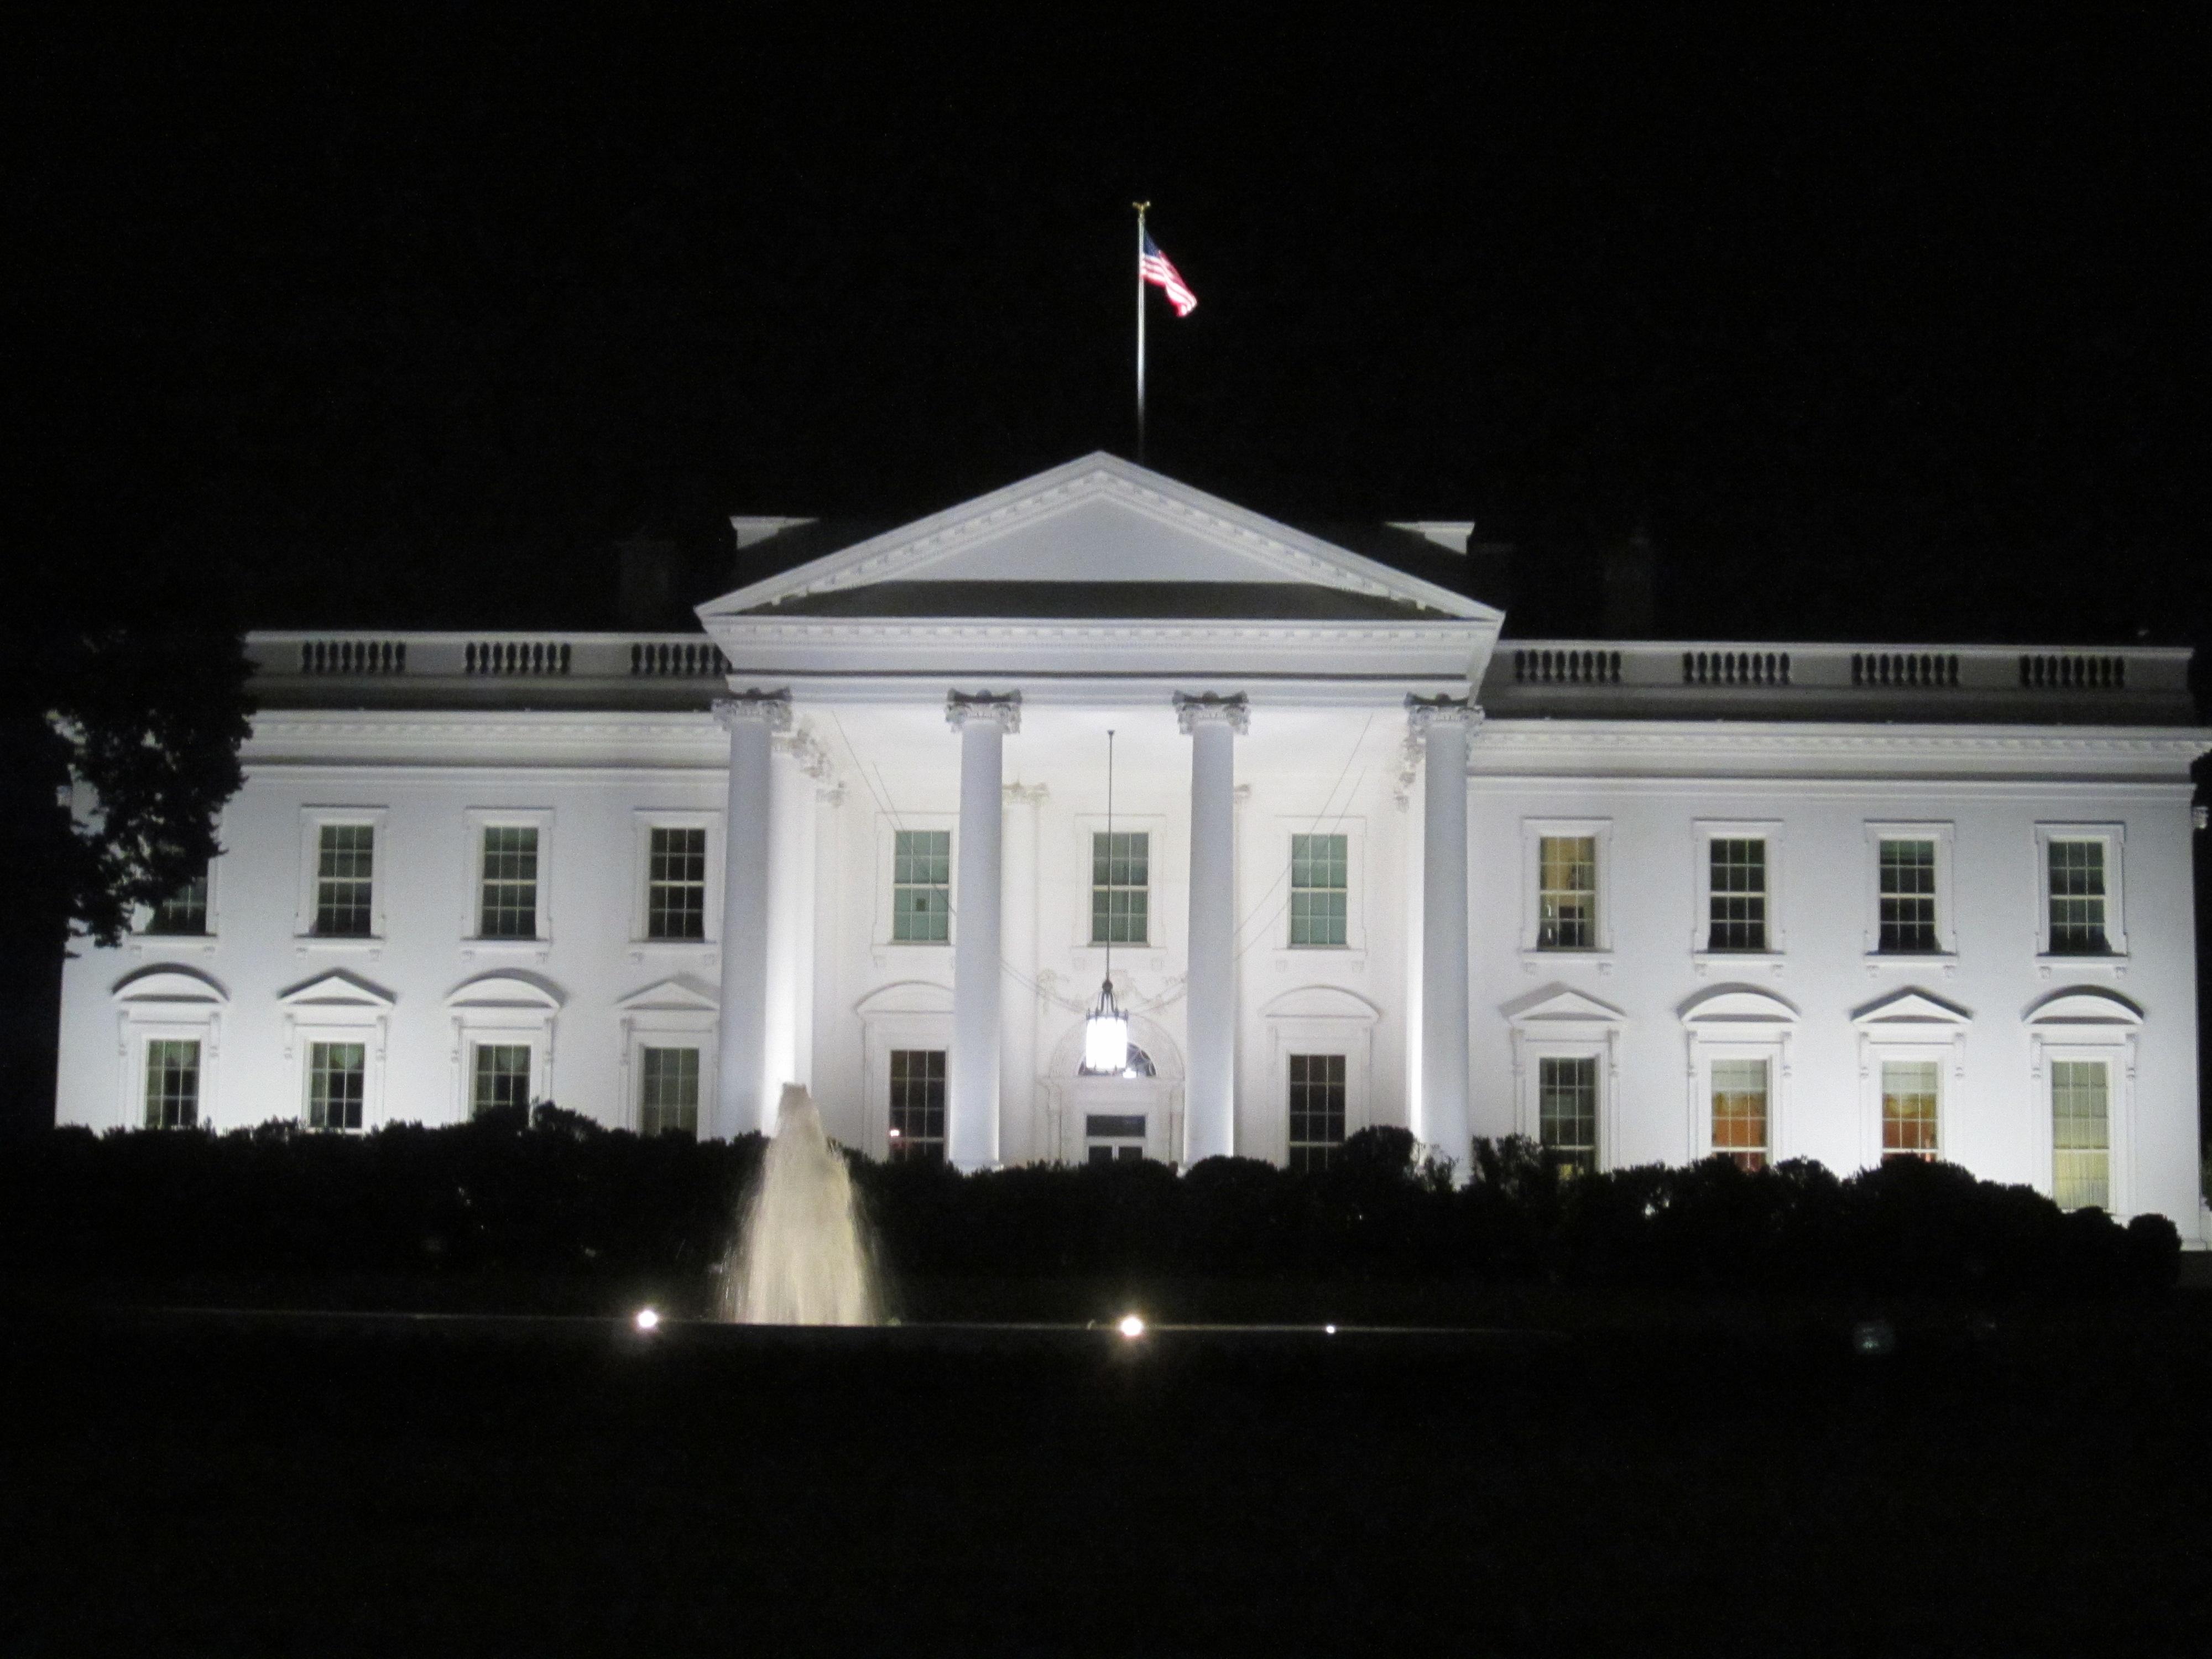 FileWhite House at night in Washington DC JPG Wikimedia